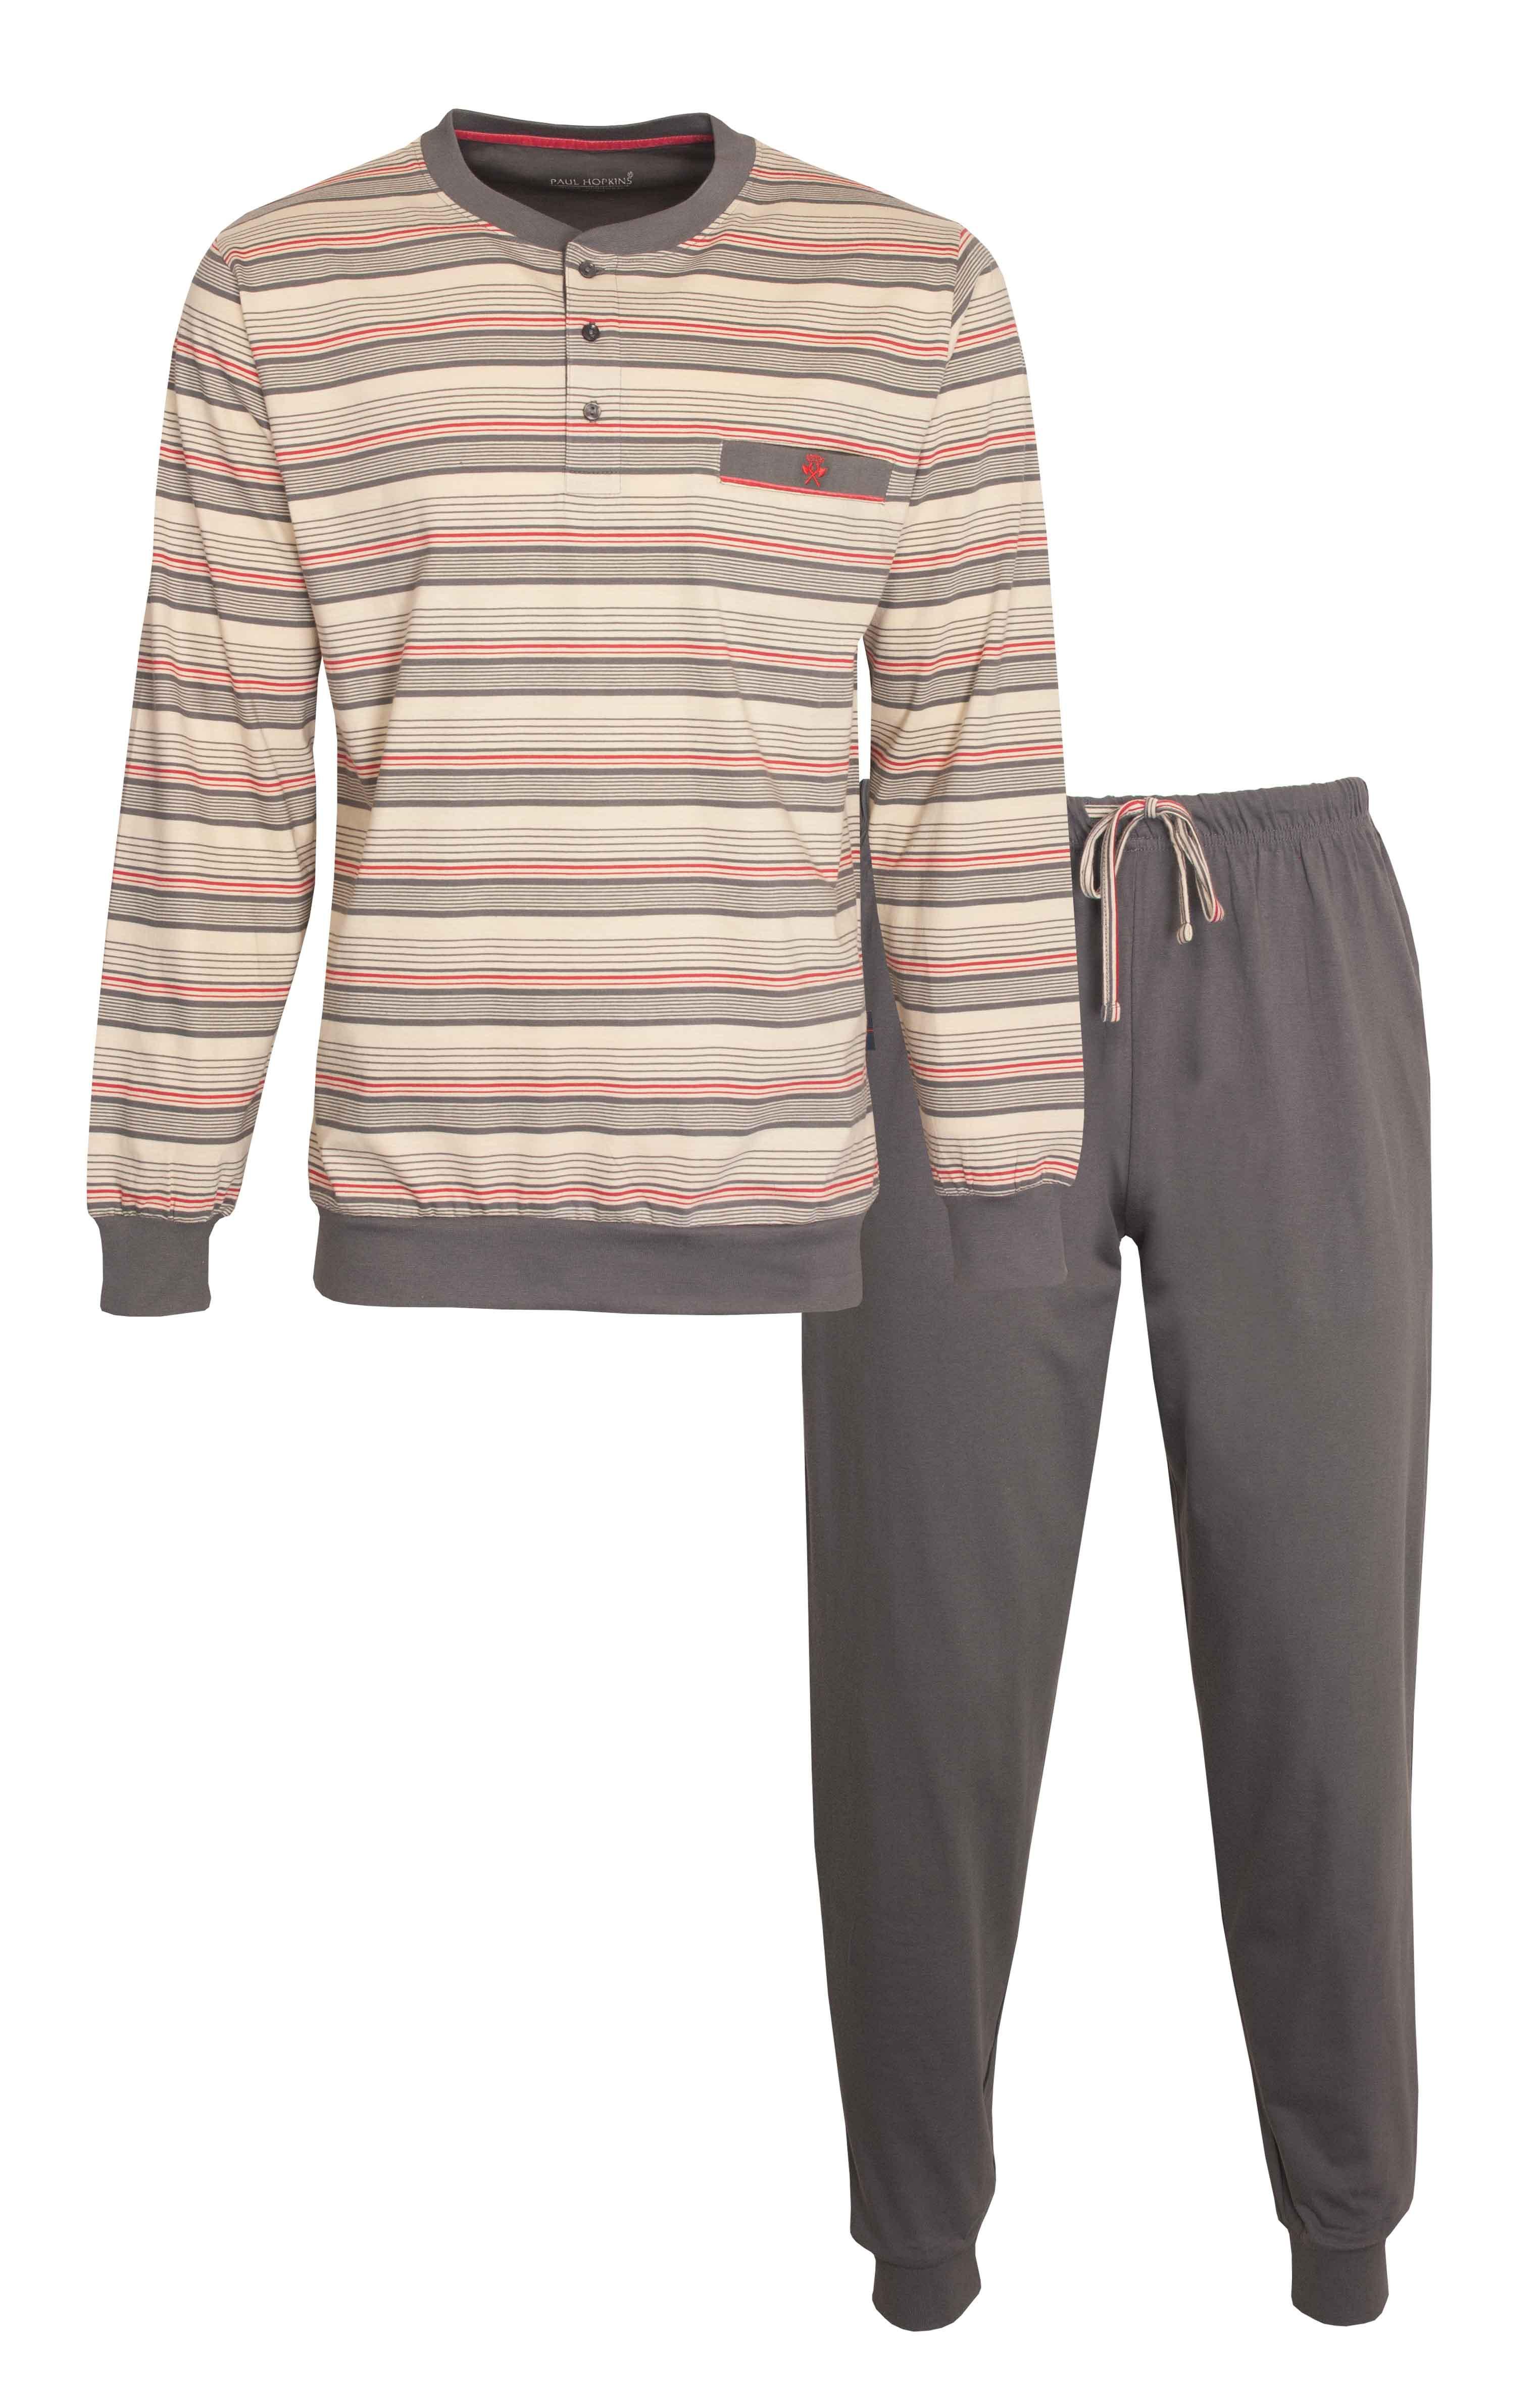 Heren pyjama PHPYH 1106A-M/50